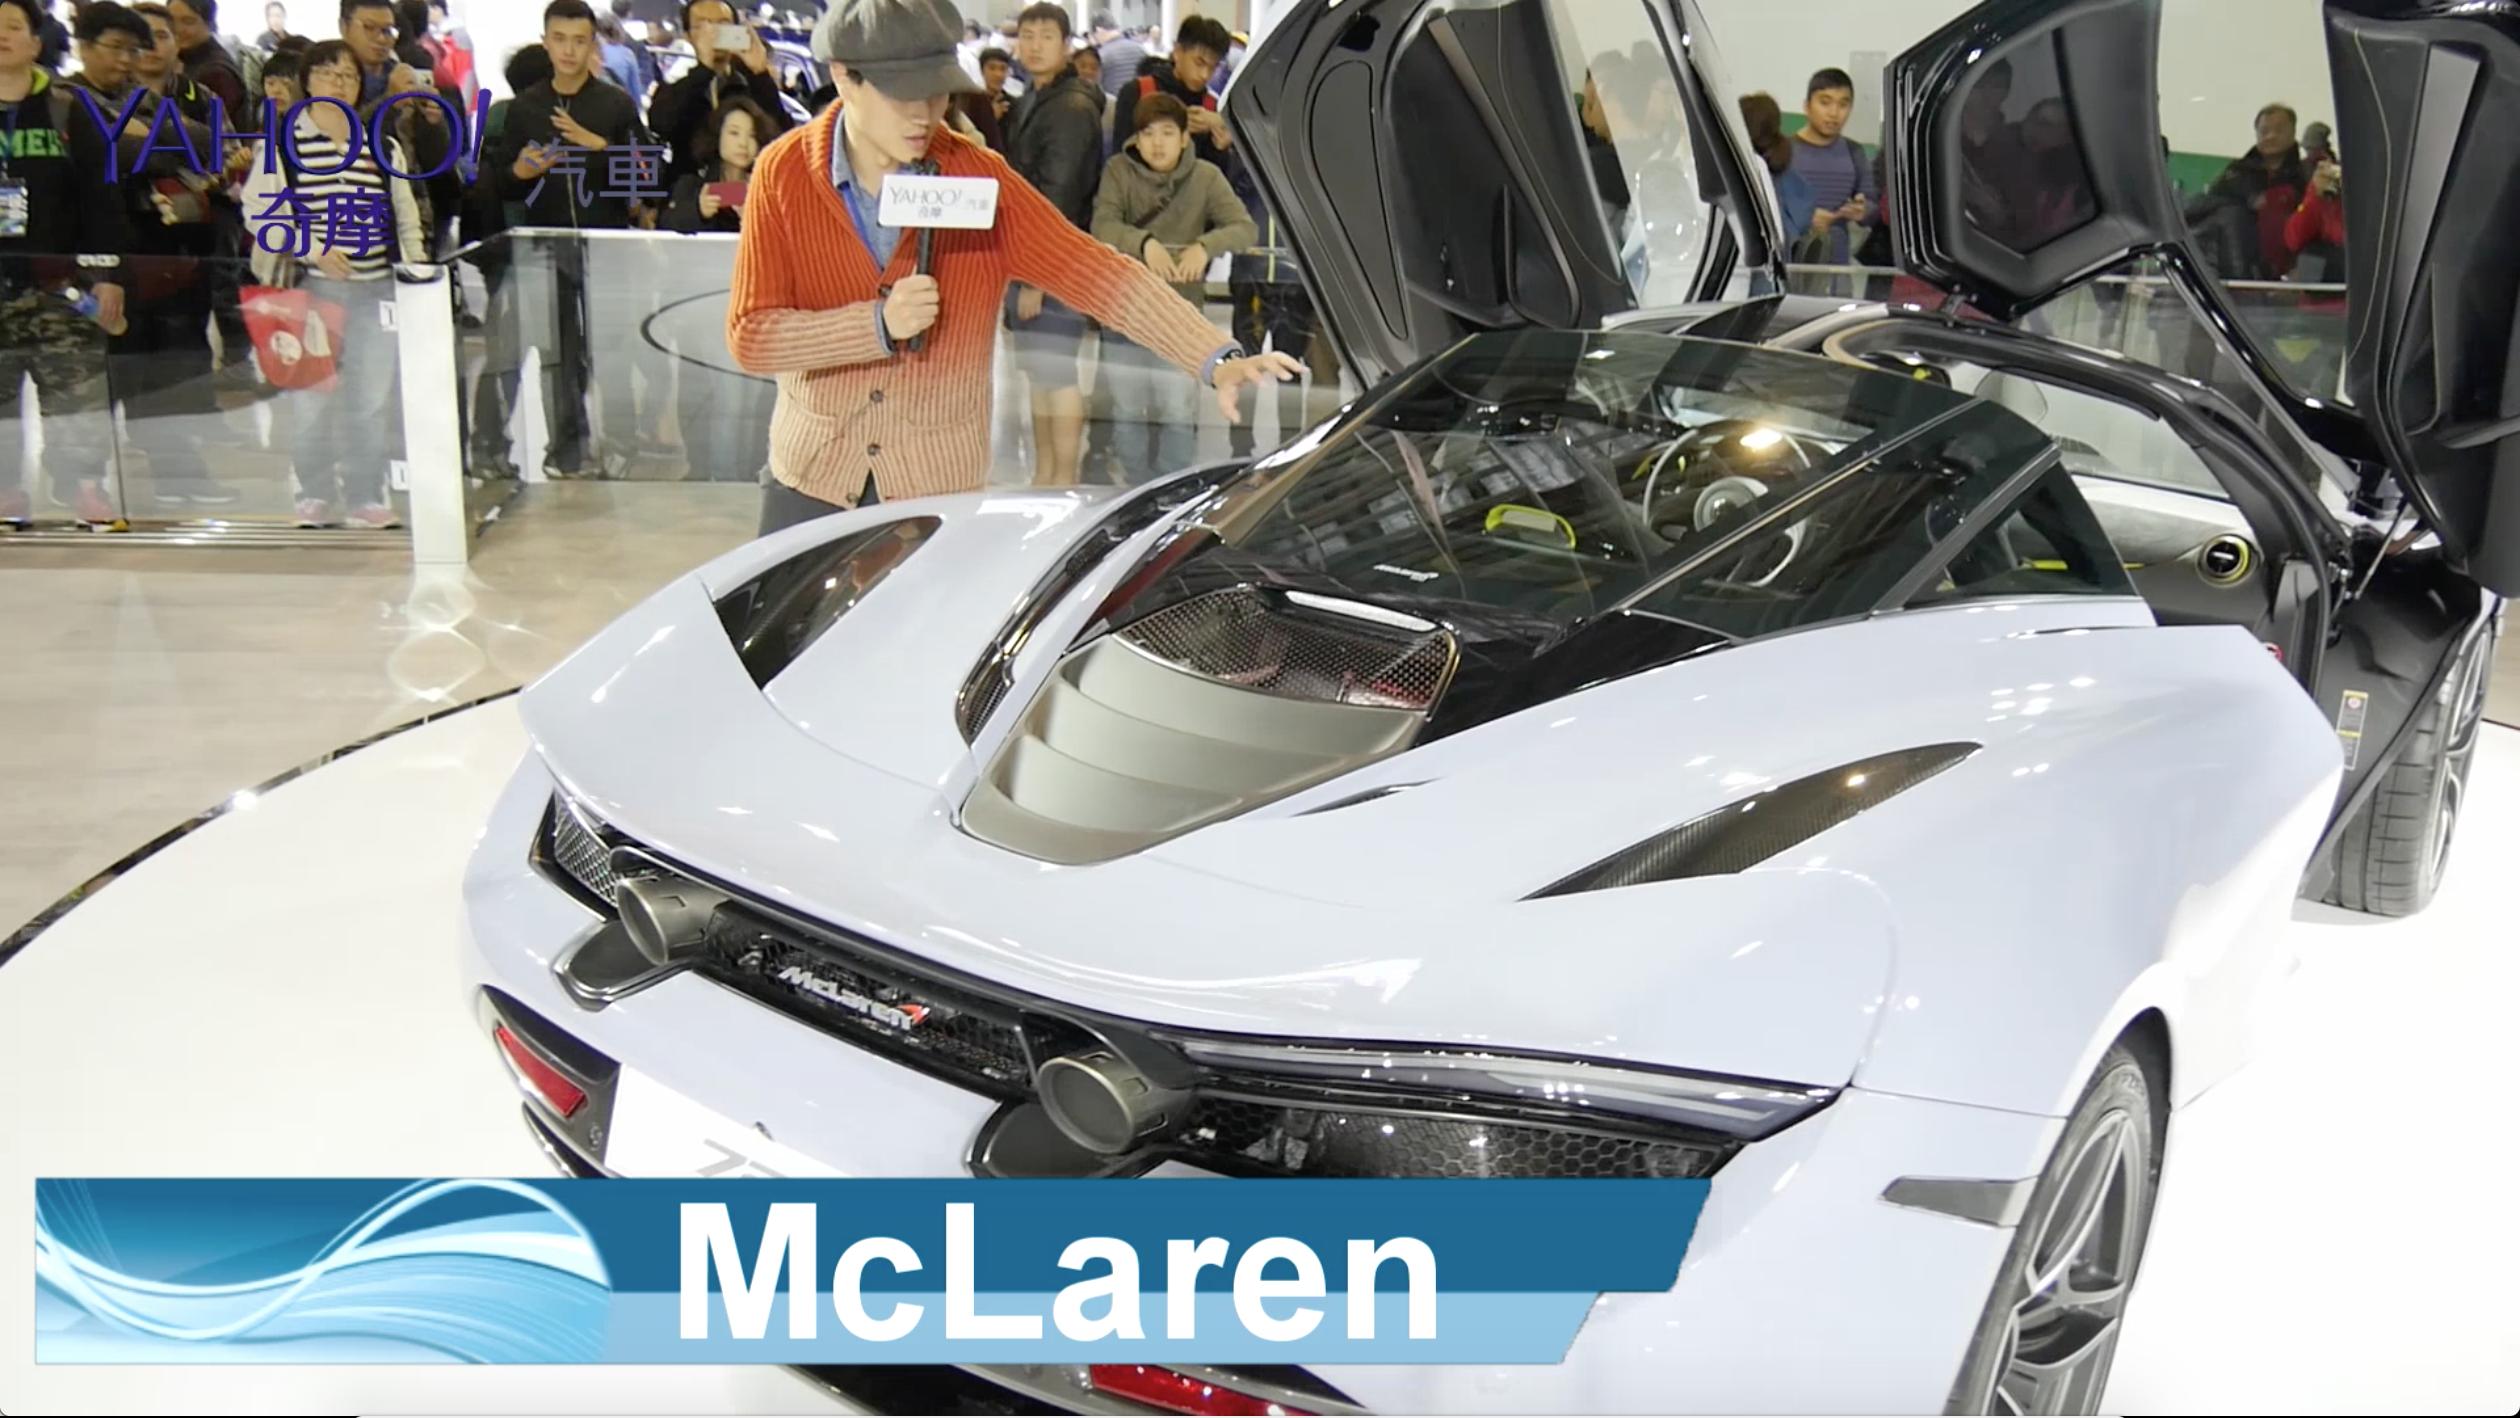 【台北車展速報】Mazda、Hyundai、Kia、Volkswagen、Skoda、McLaren、Aston Martin以及Bentley展場重點導覽!